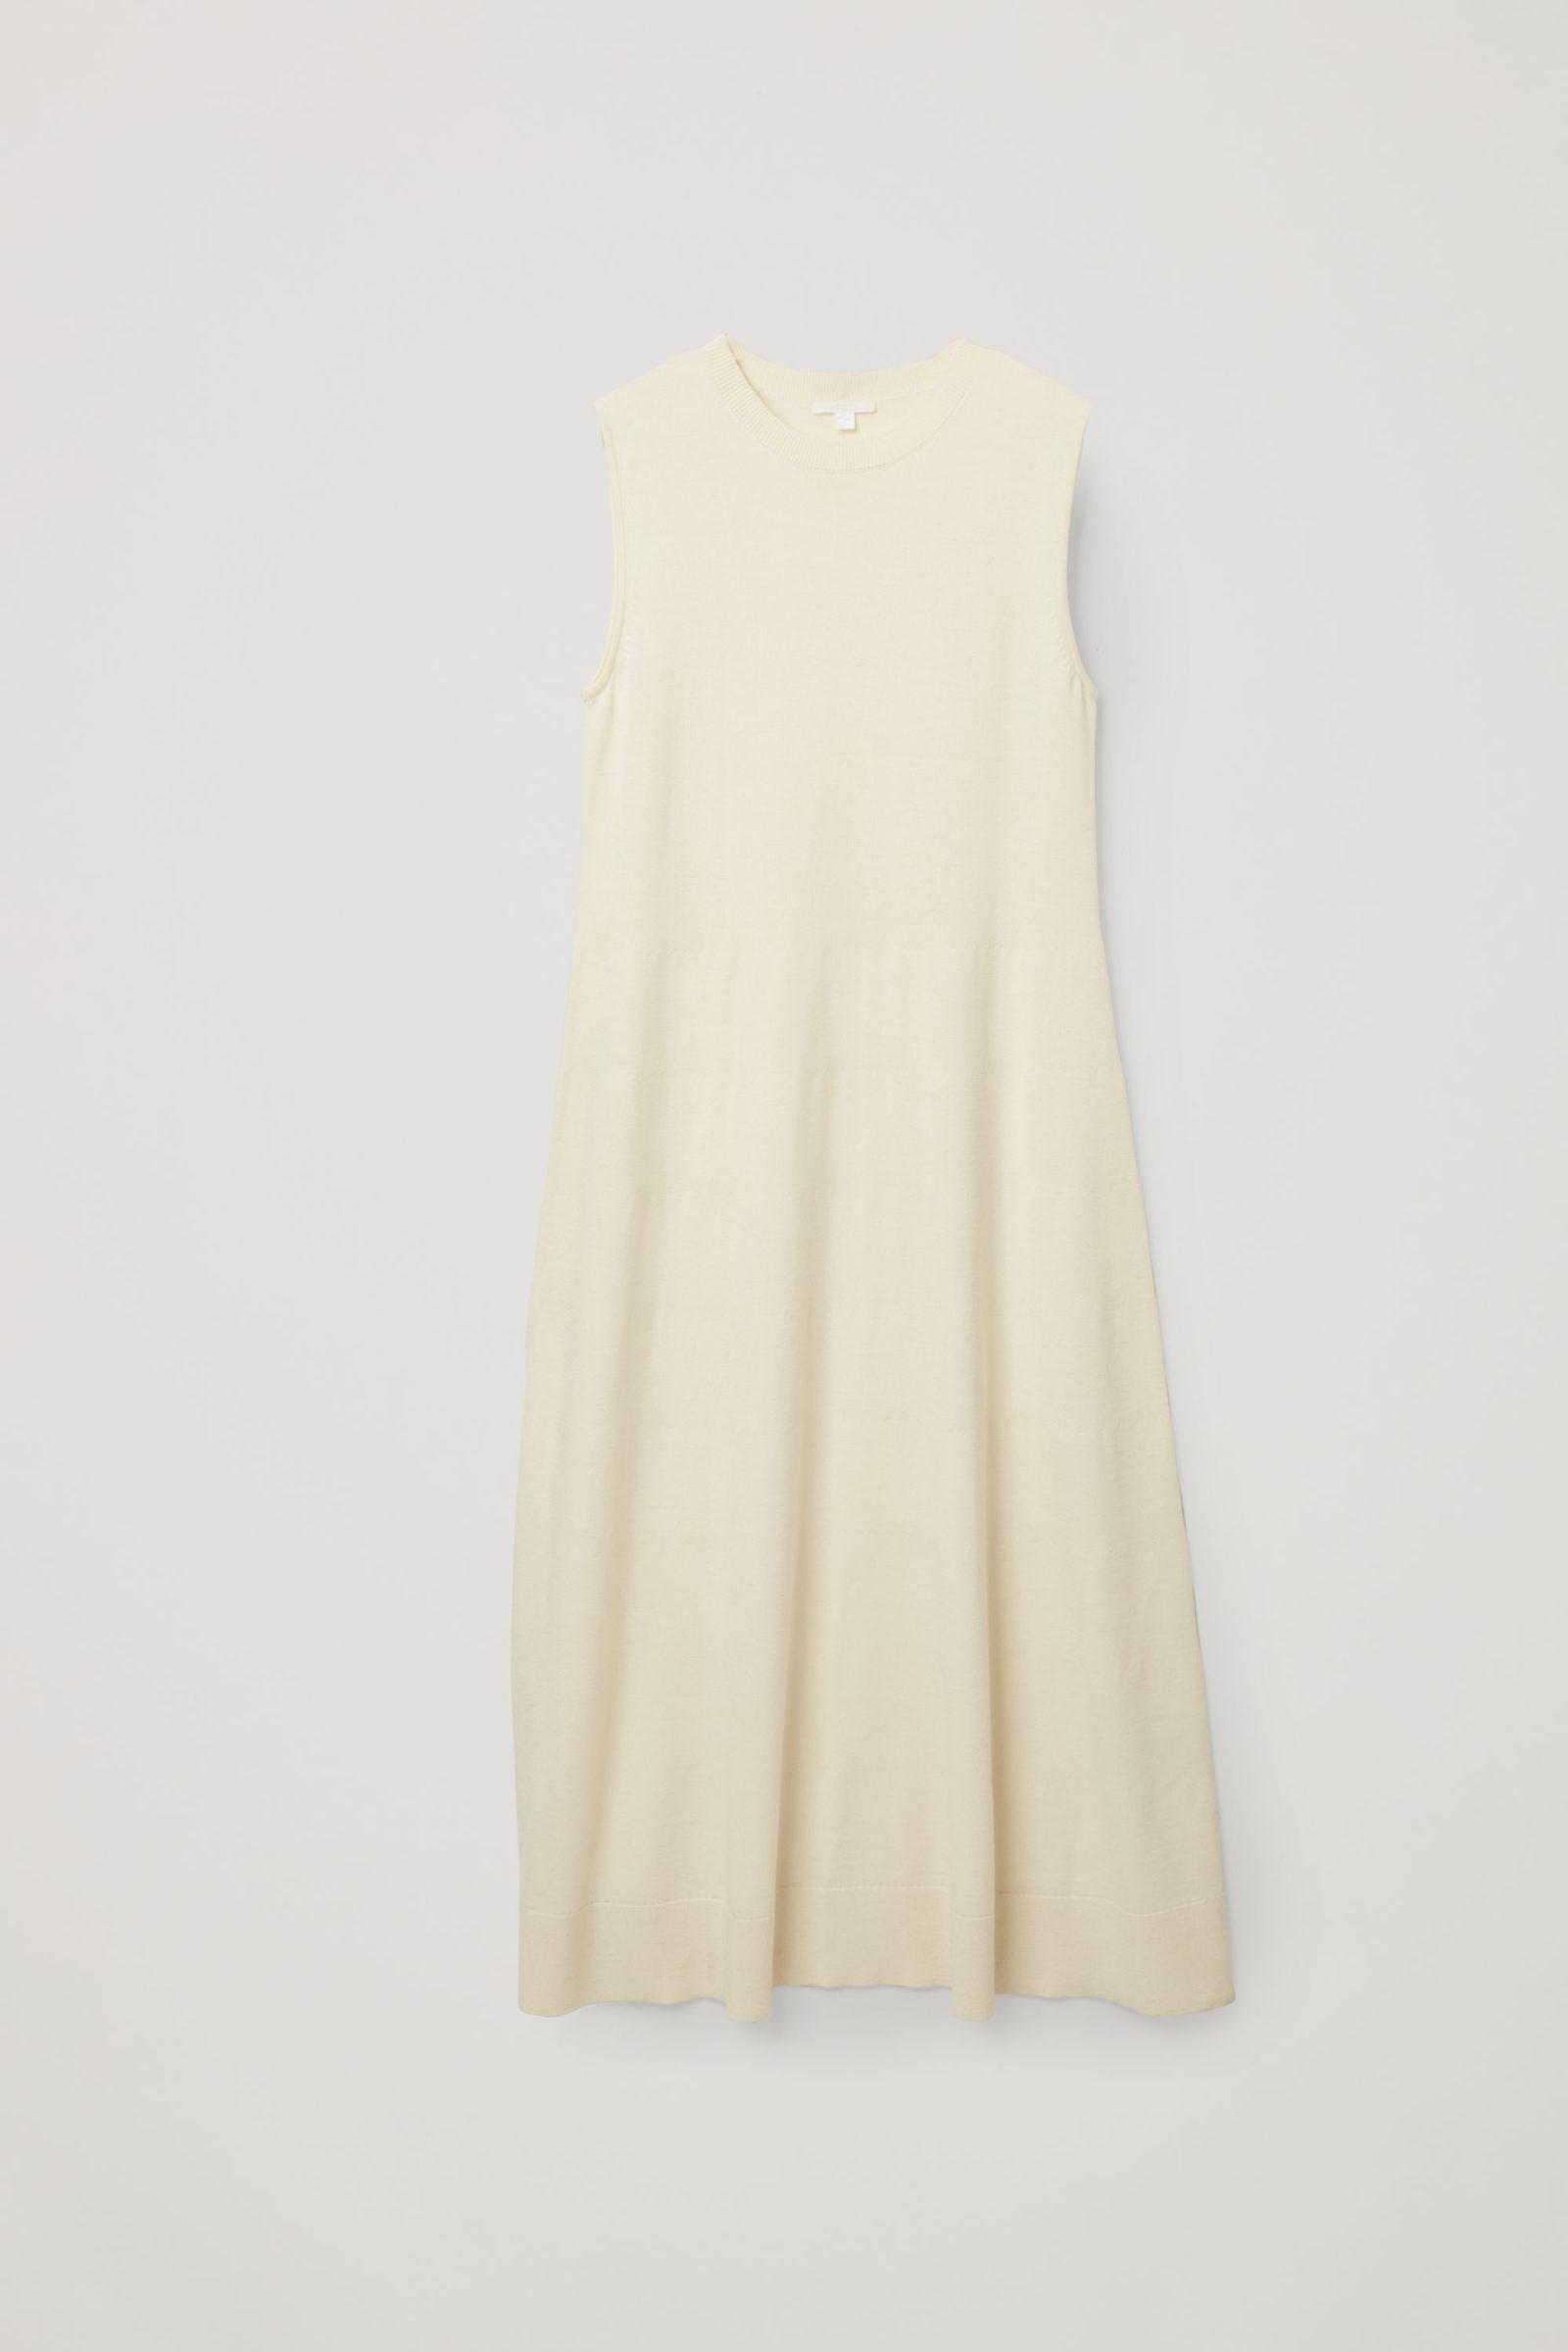 COS 니티드 A라인 메리노 울 드레스의 오프 화이트컬러 Product입니다.